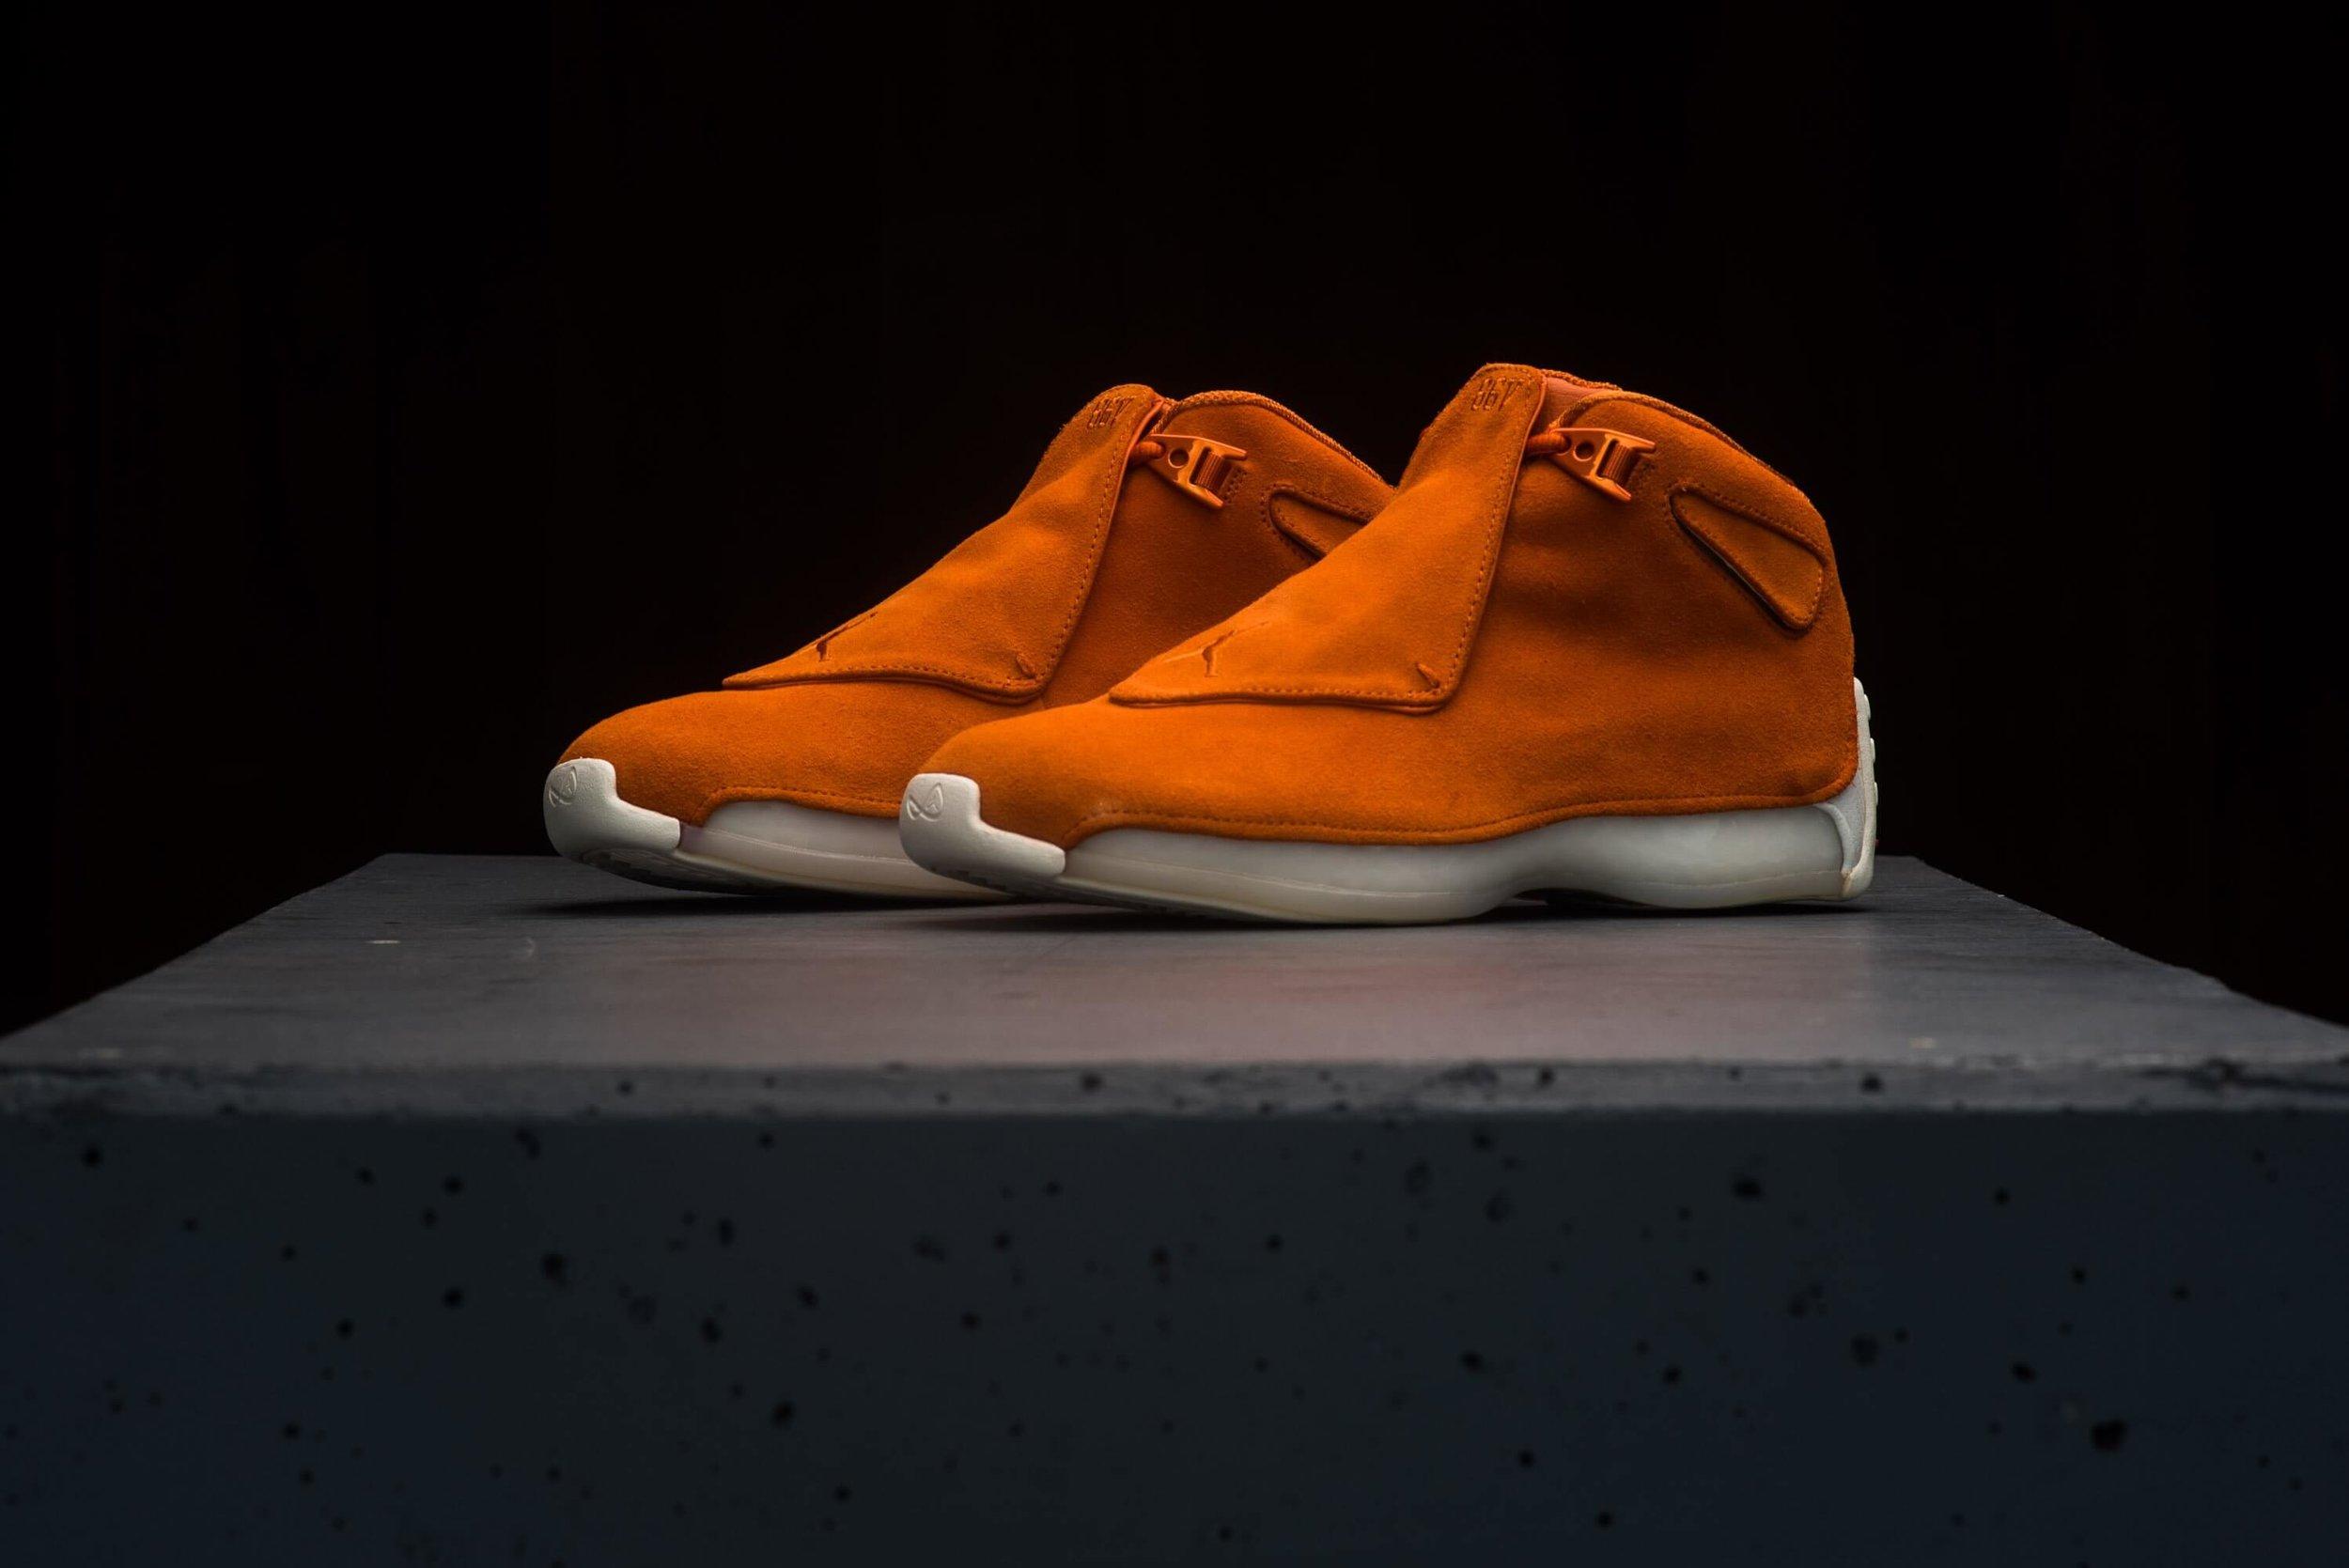 Air_JOrdan_18_Retro_Premium_Suede_Pack_Sneaker_Politics-2.jpg